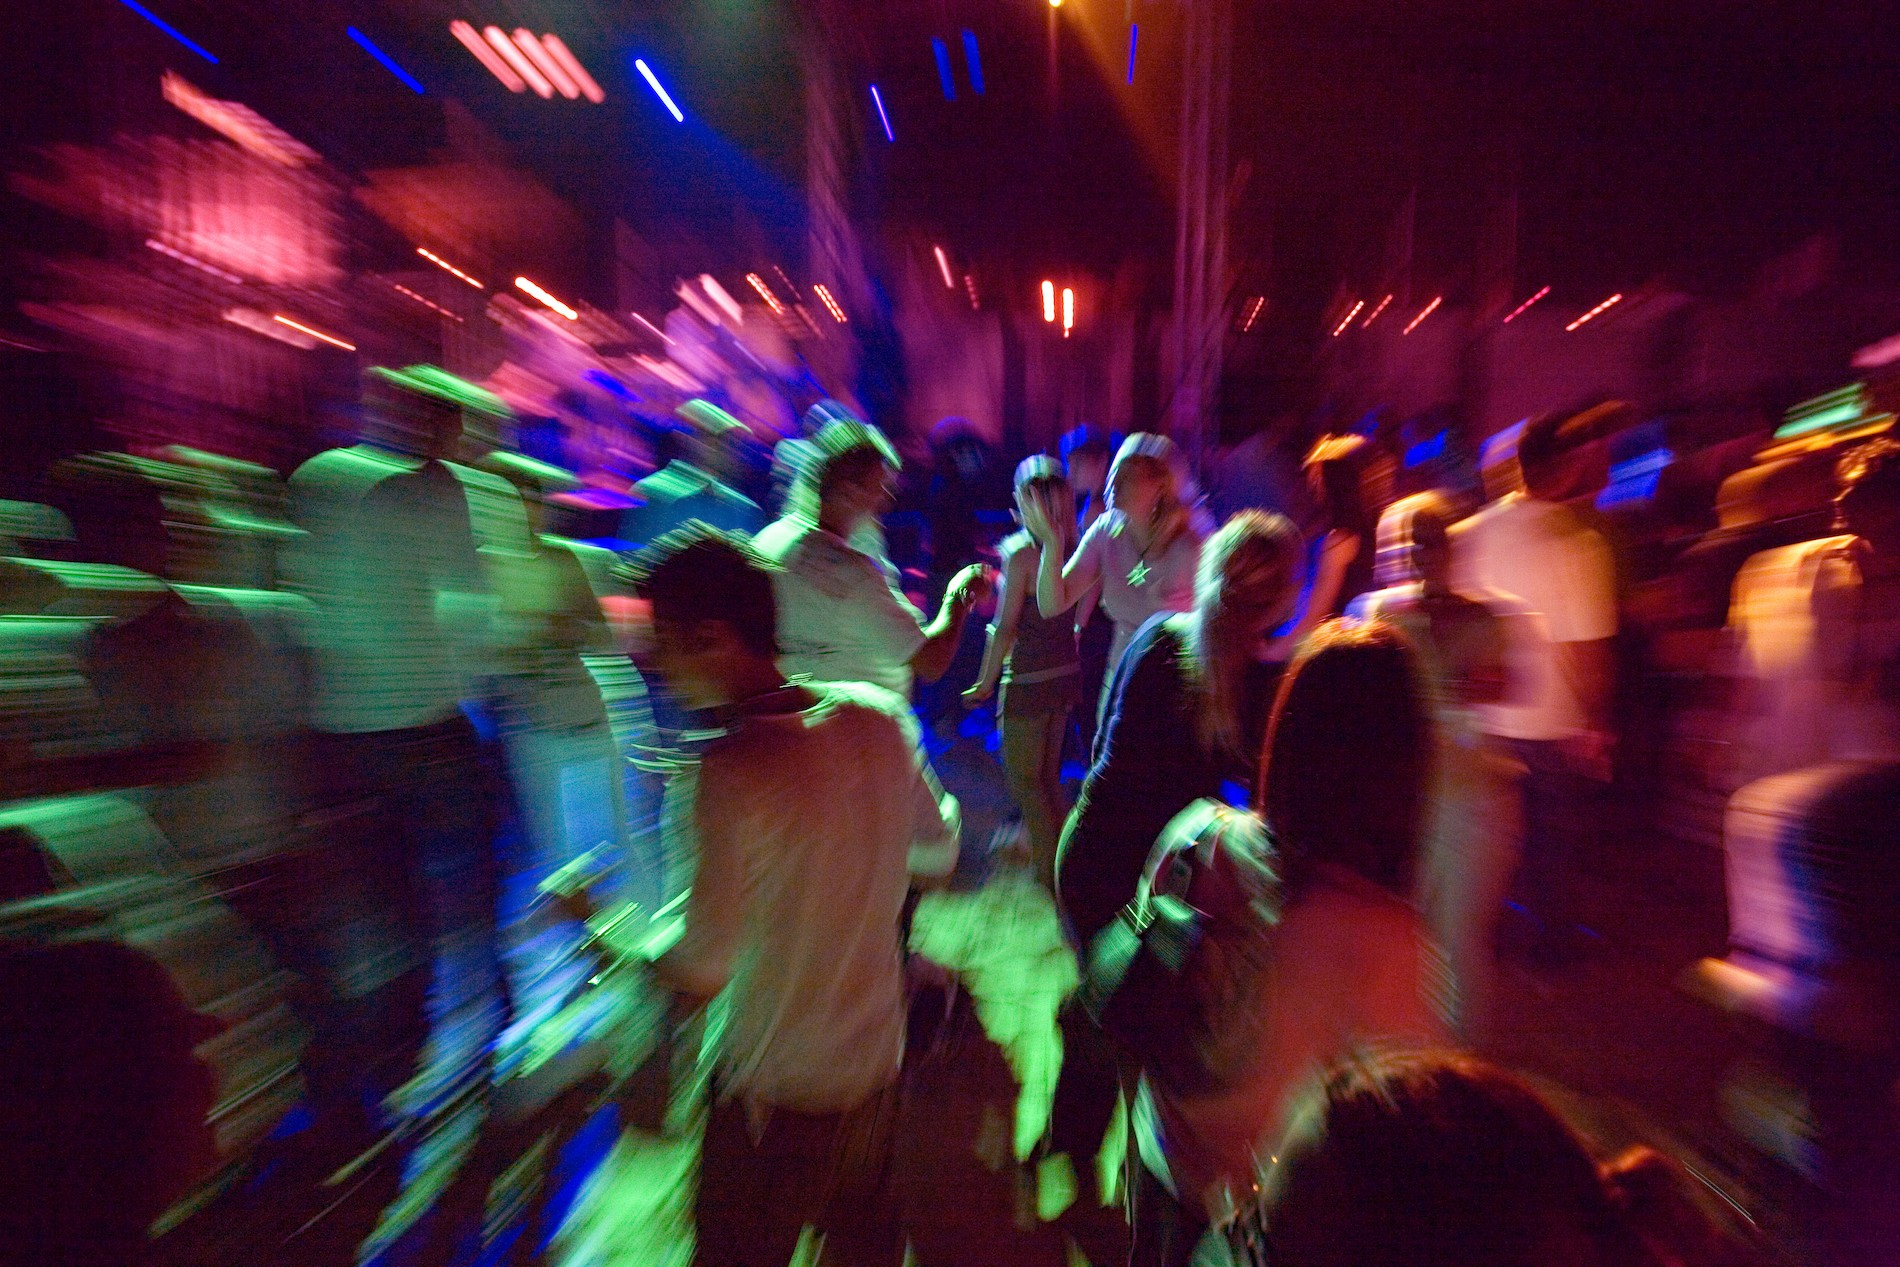 Baños Discoteca Porno sexo baño discoteca madrid